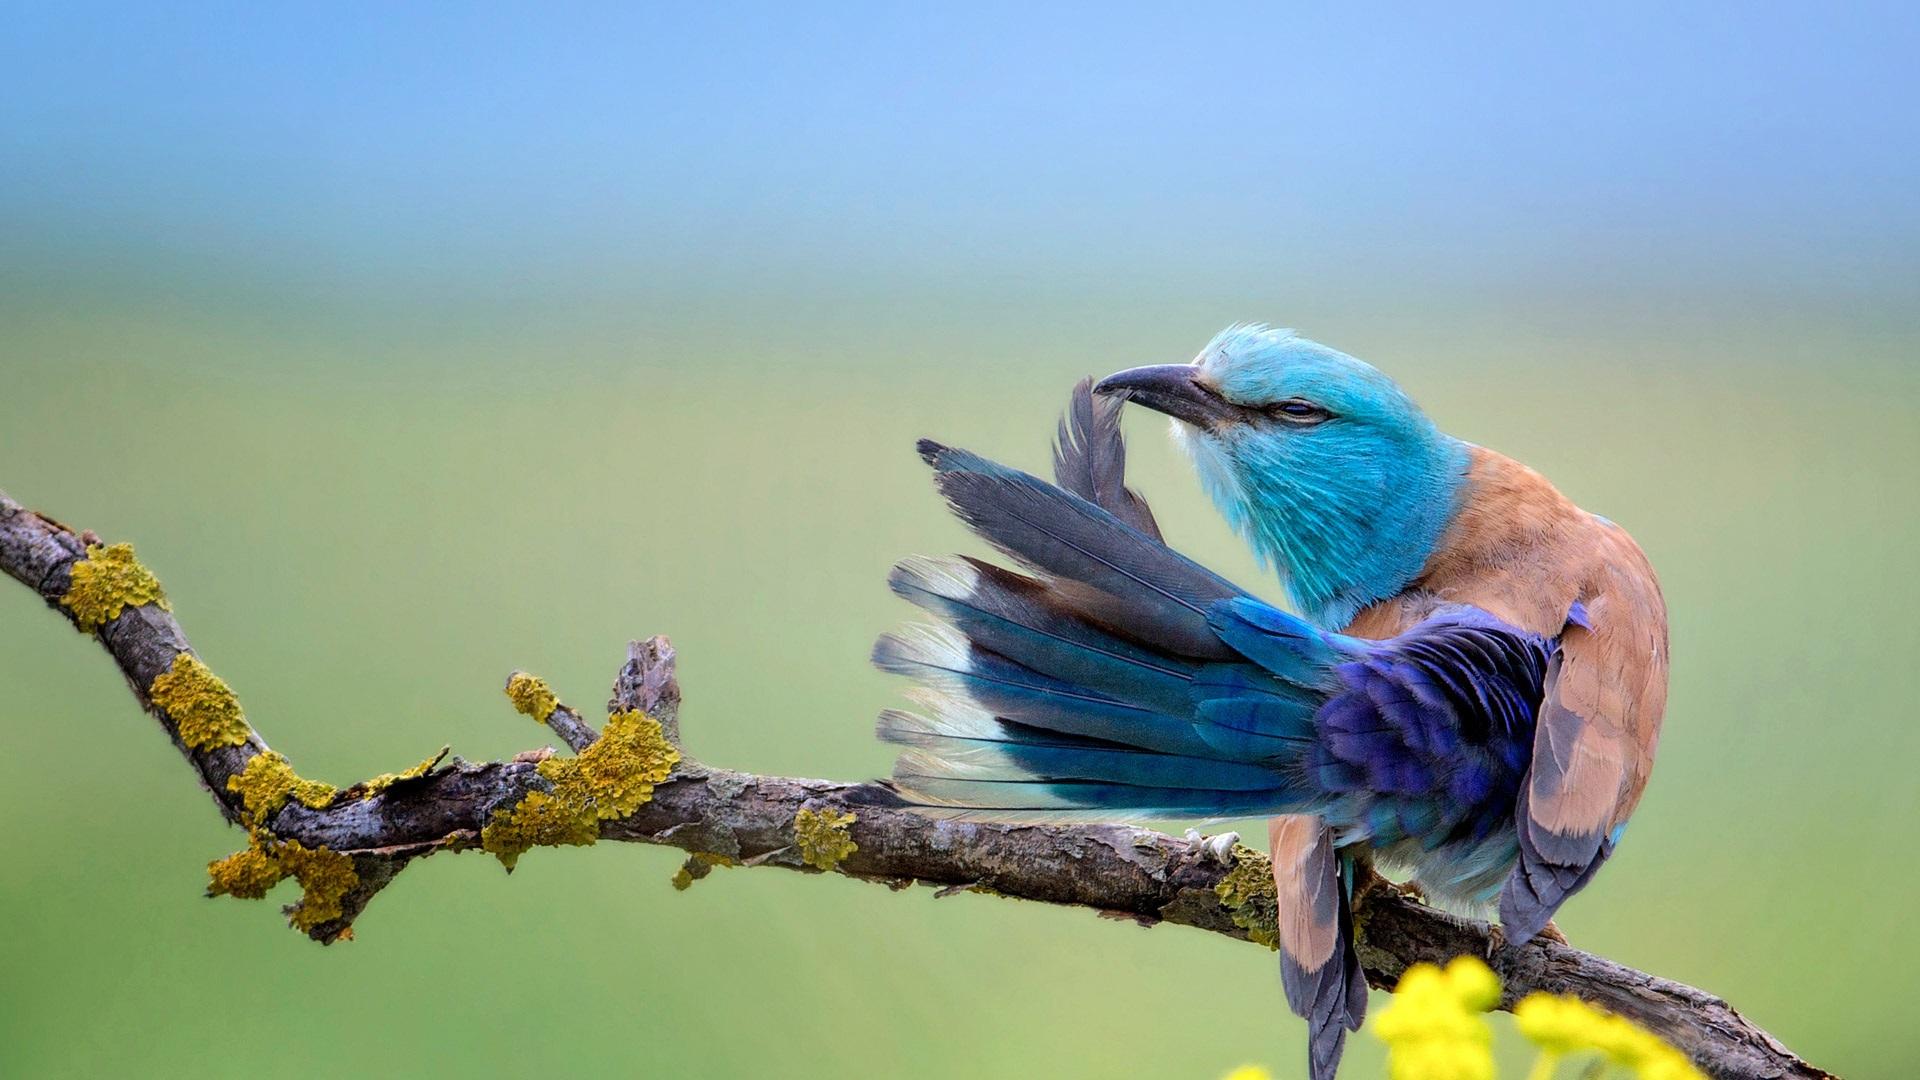 Fonds D Ecran Coracias Garrulus Bleu Oiseau De Plumes